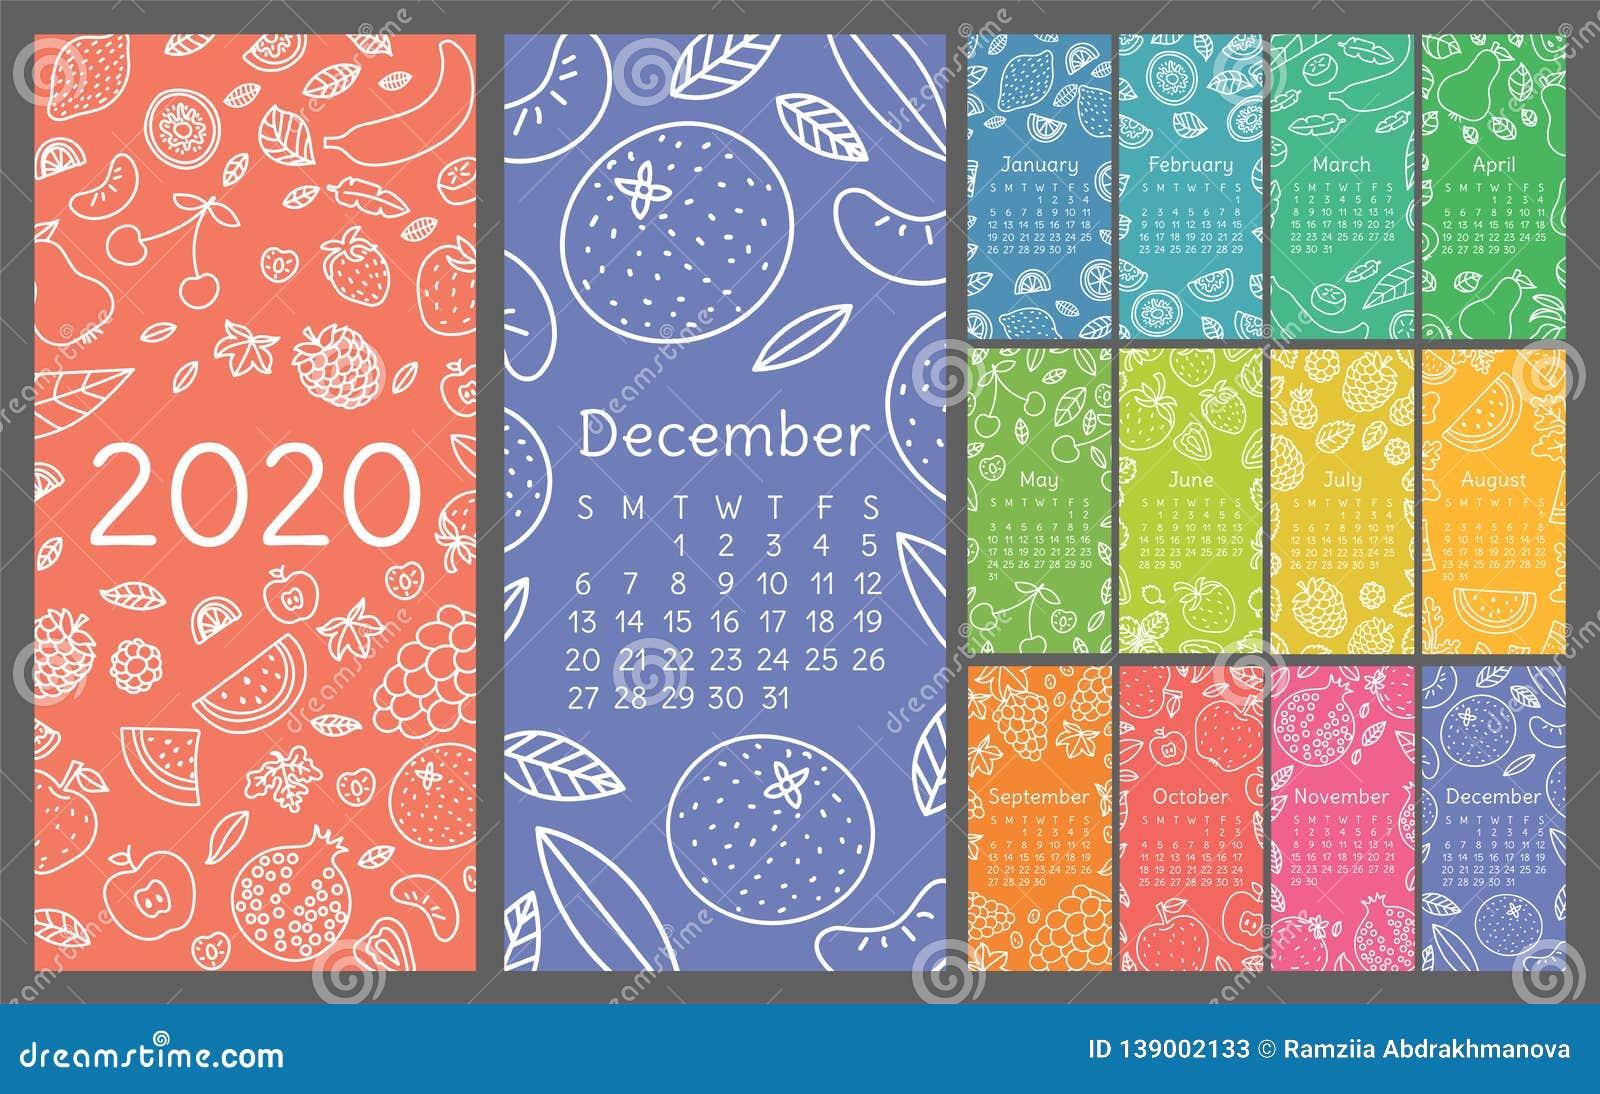 Calendar 2020. Vector English wall calender template. Fruits, berries. Lemon, kiwi, banana, pear, cherry, strawberry, raspberry,